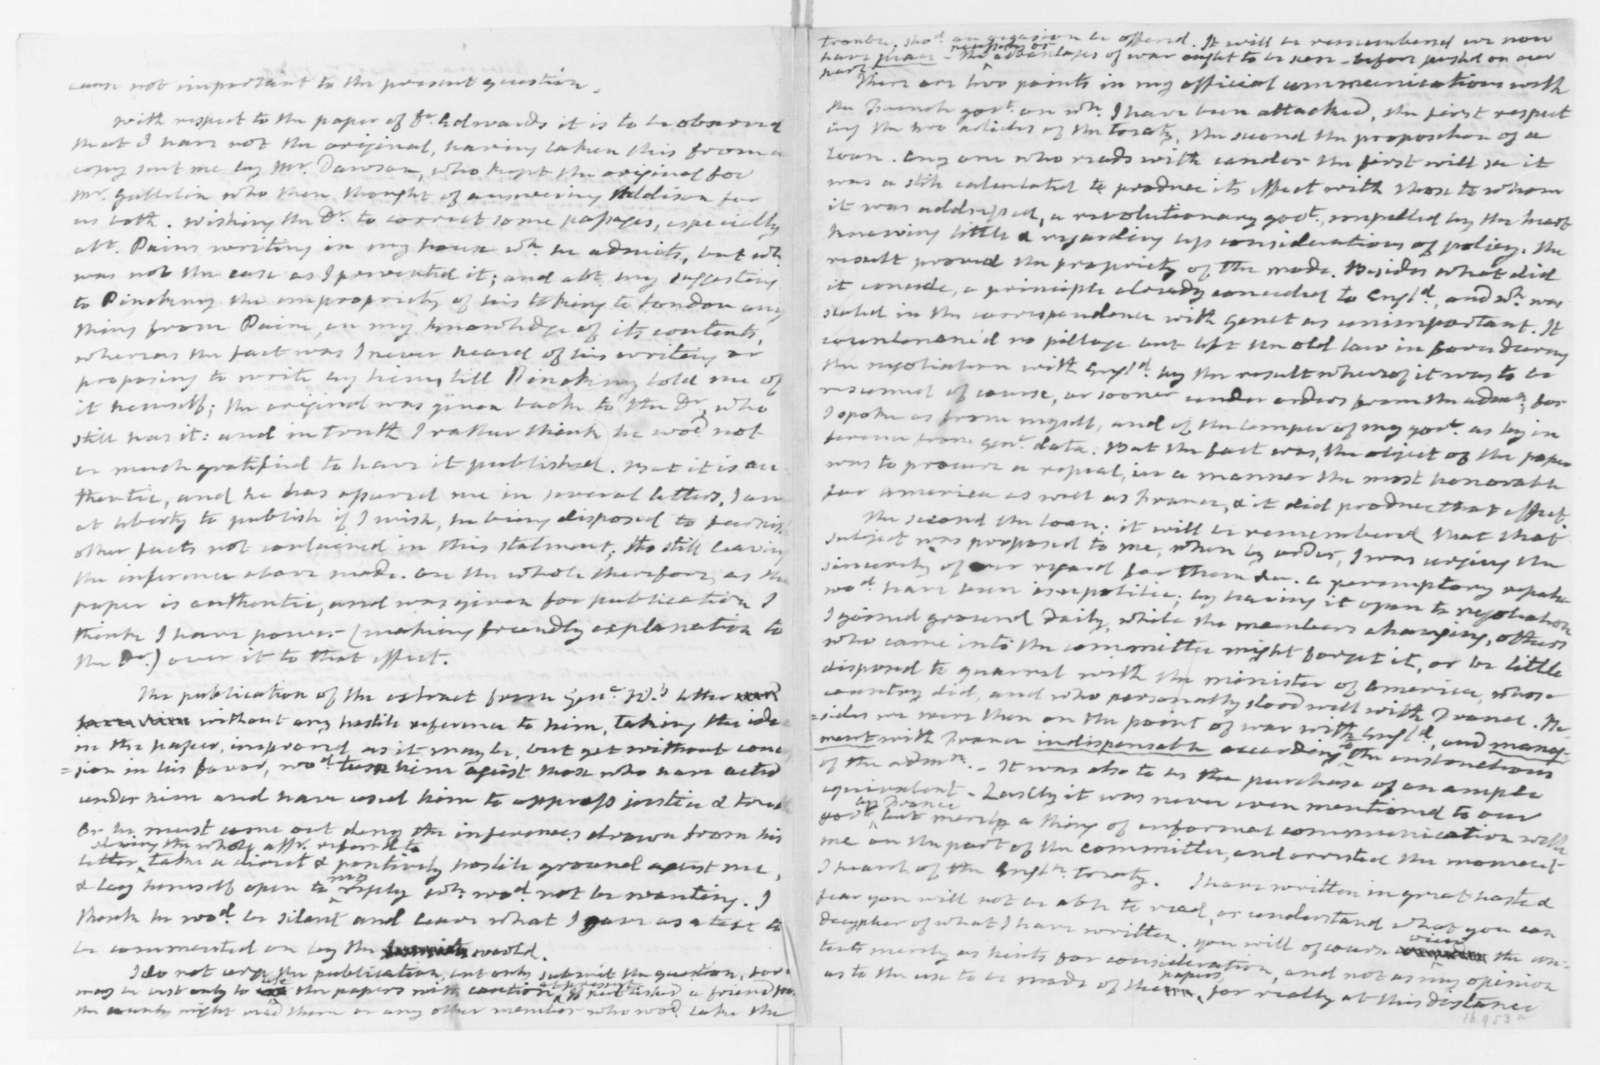 James Monroe to James Madison, December 7, 1799. Includes affidavits of Skipwith, Morris and Burling.